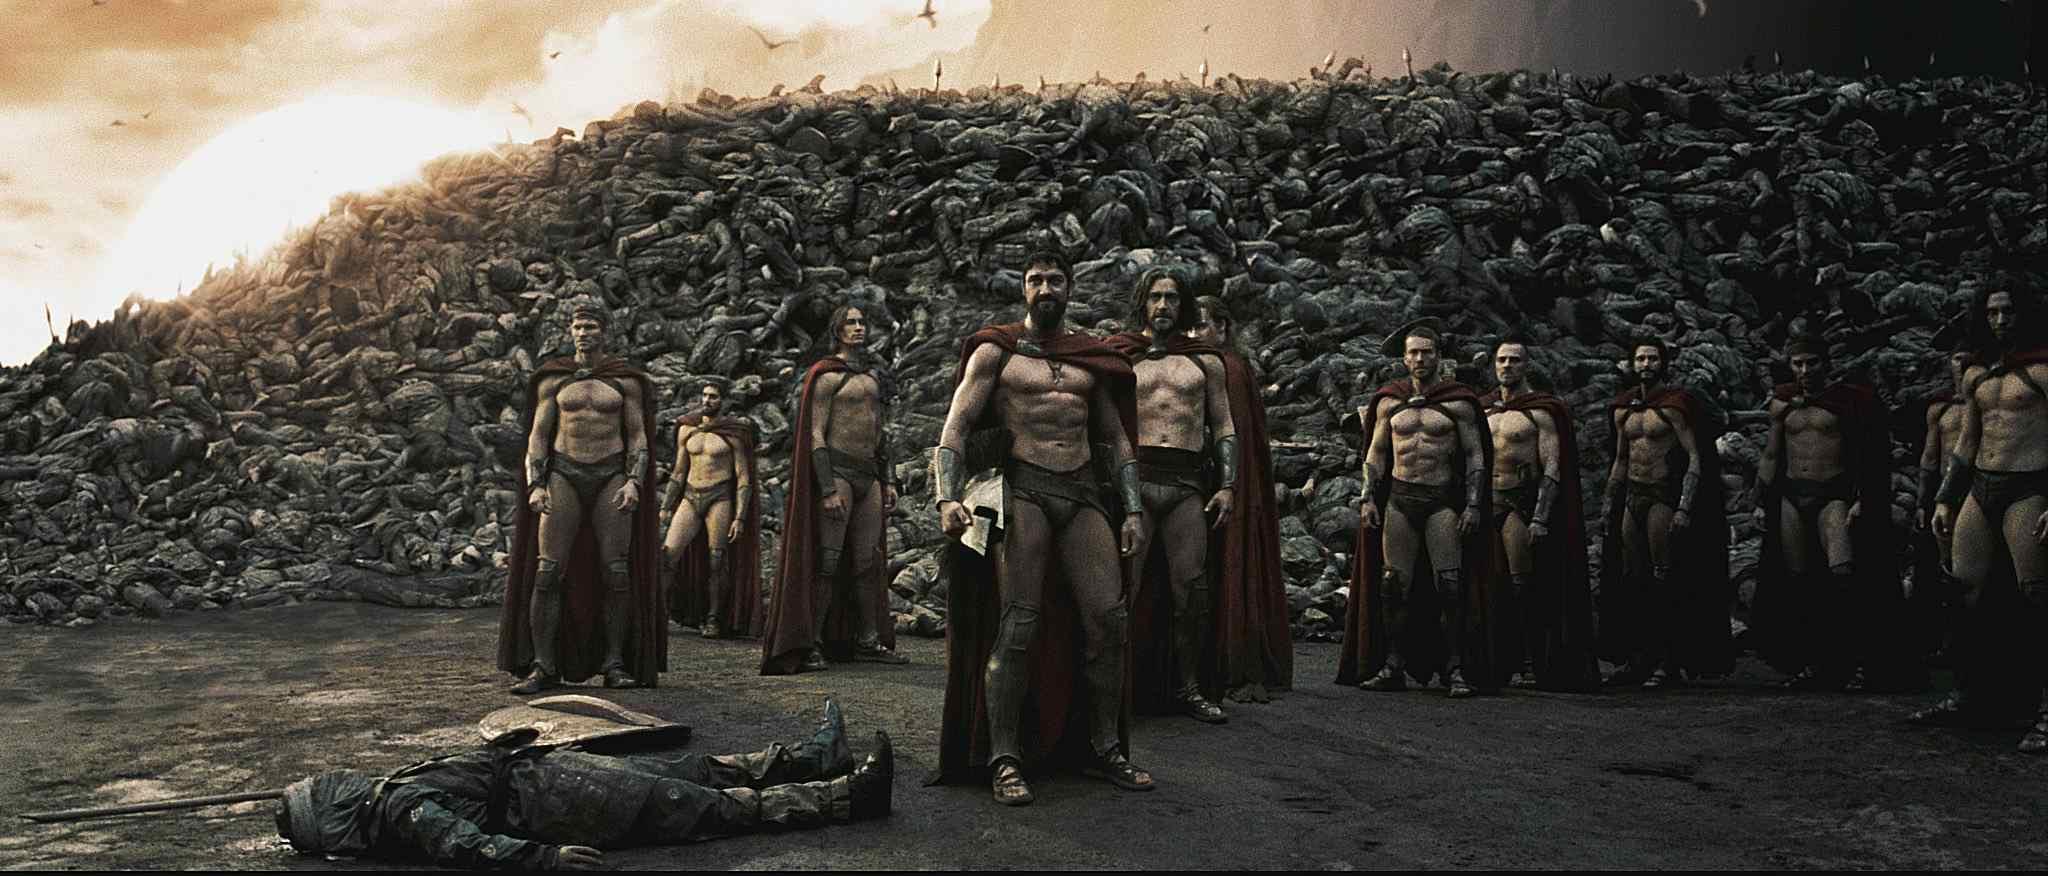 Astinos, Leonidas, and Captain